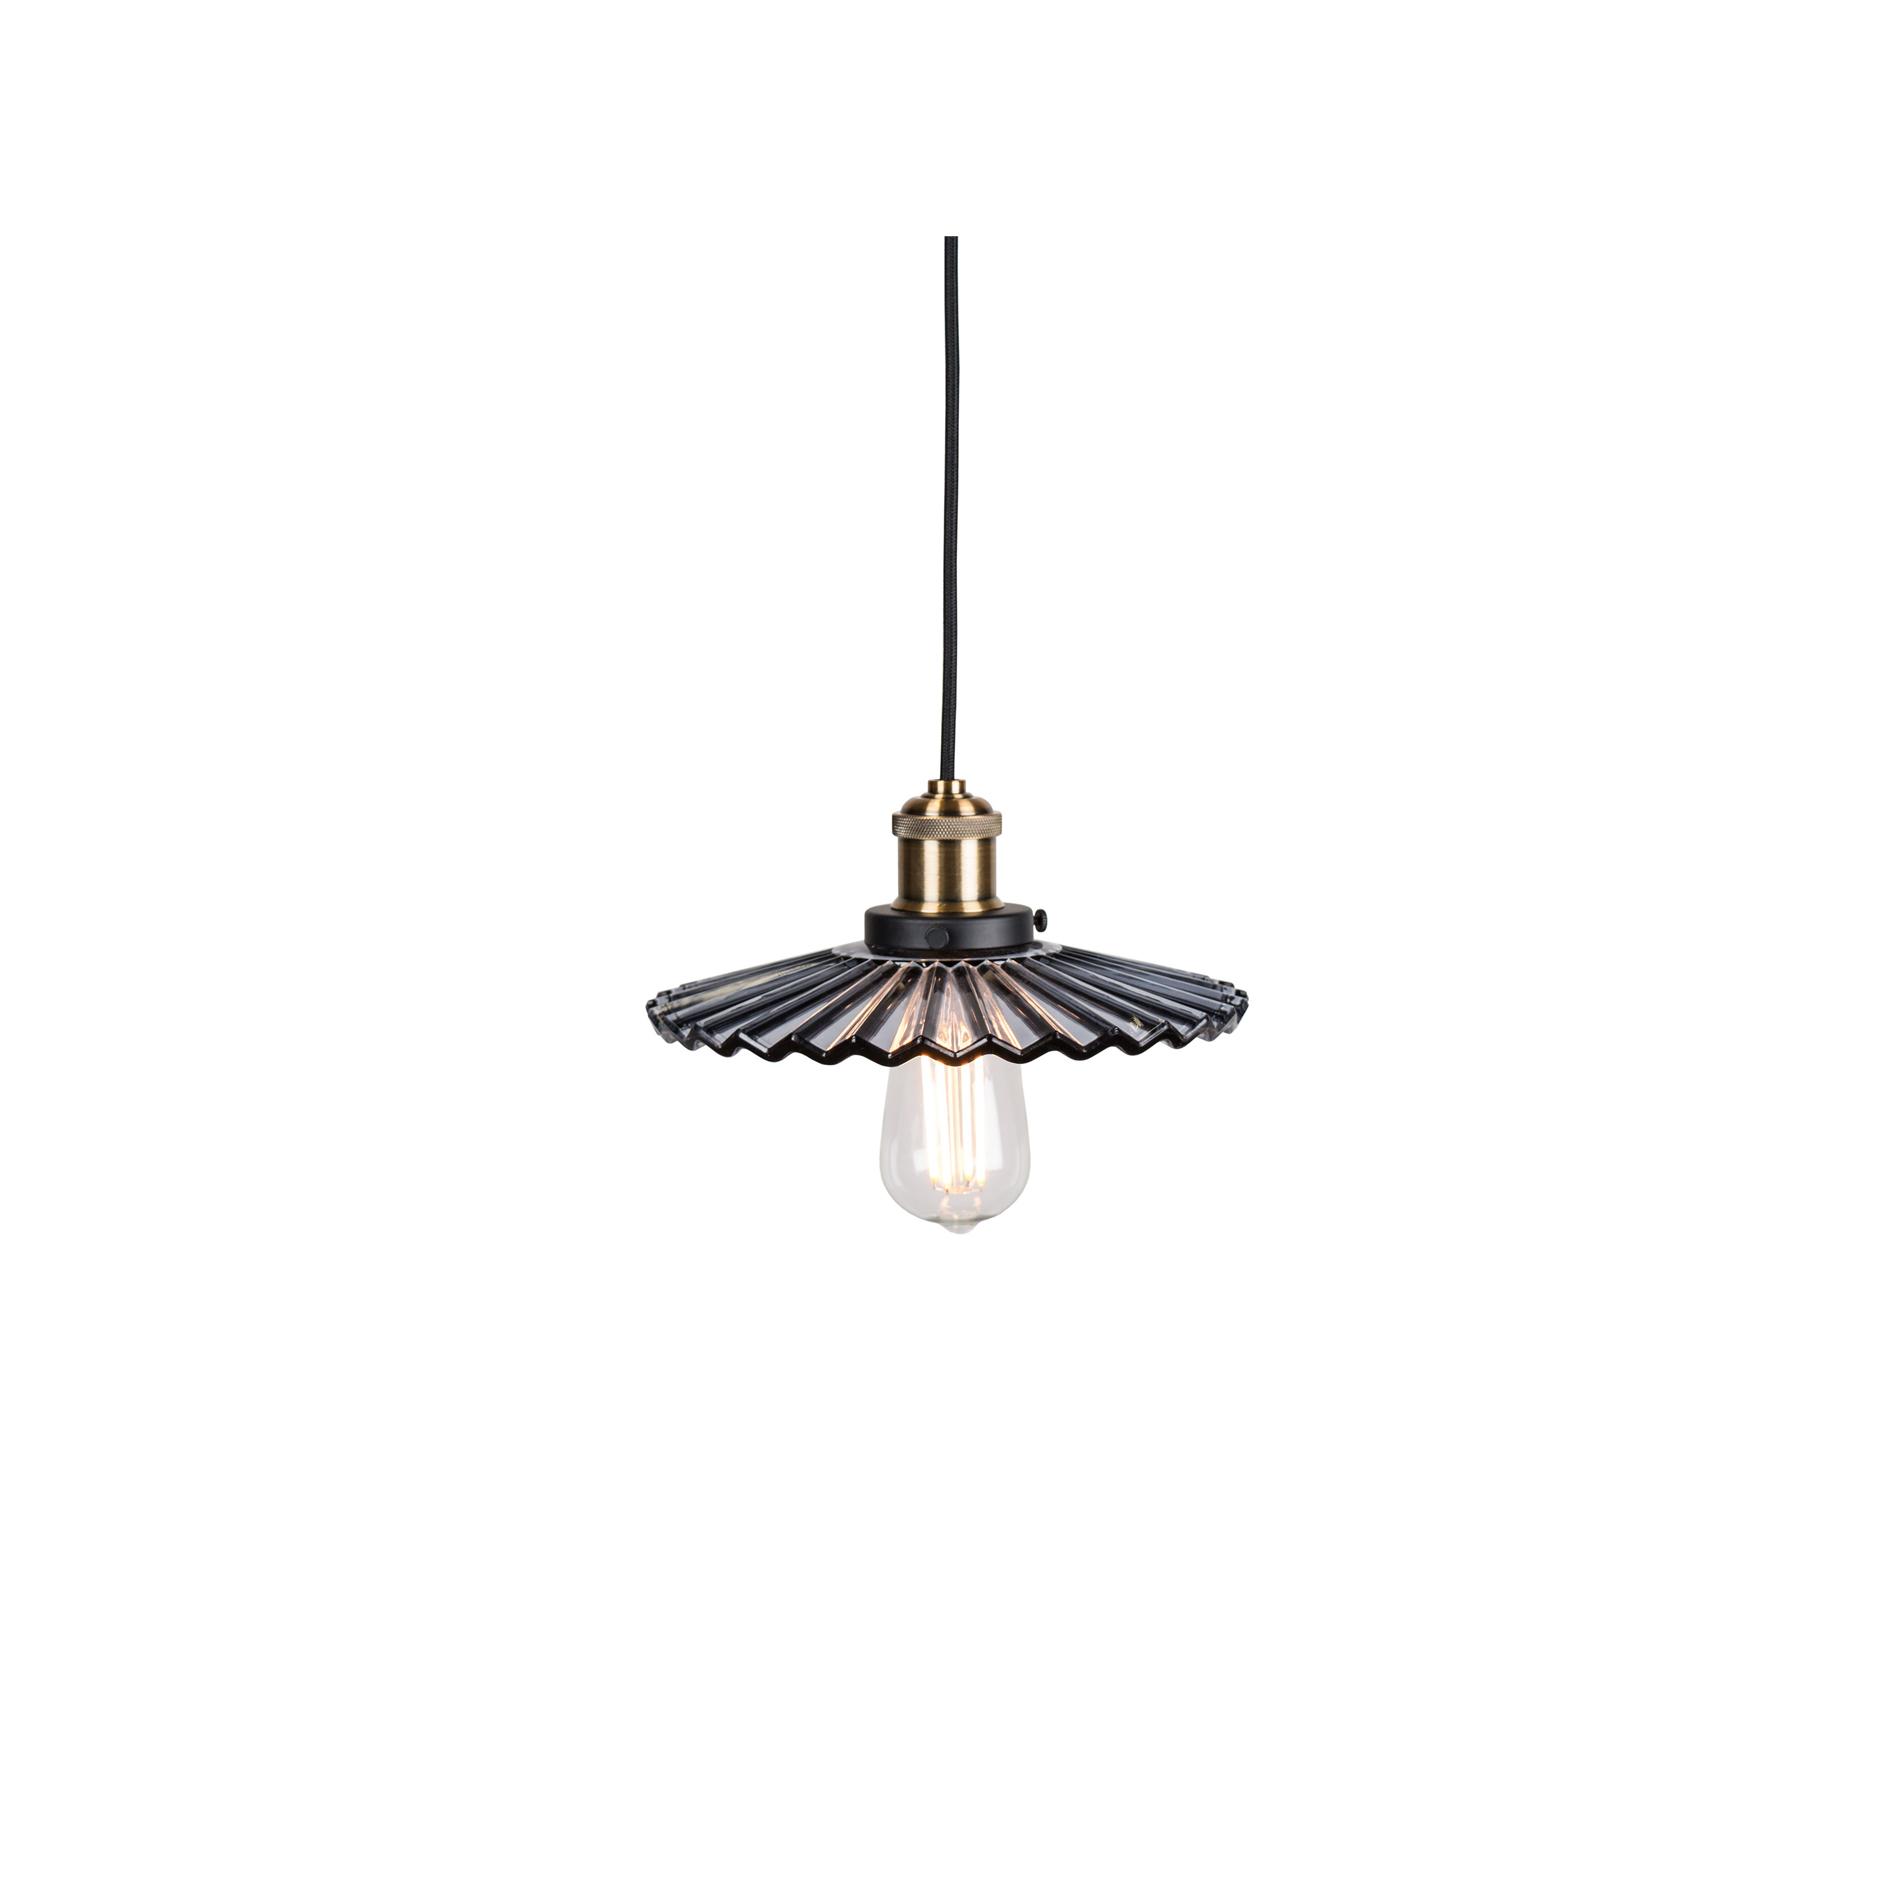 S vedalens belysning globen lighting mini cobbler pendel r k s vedalens belysning - Globen lighting ...